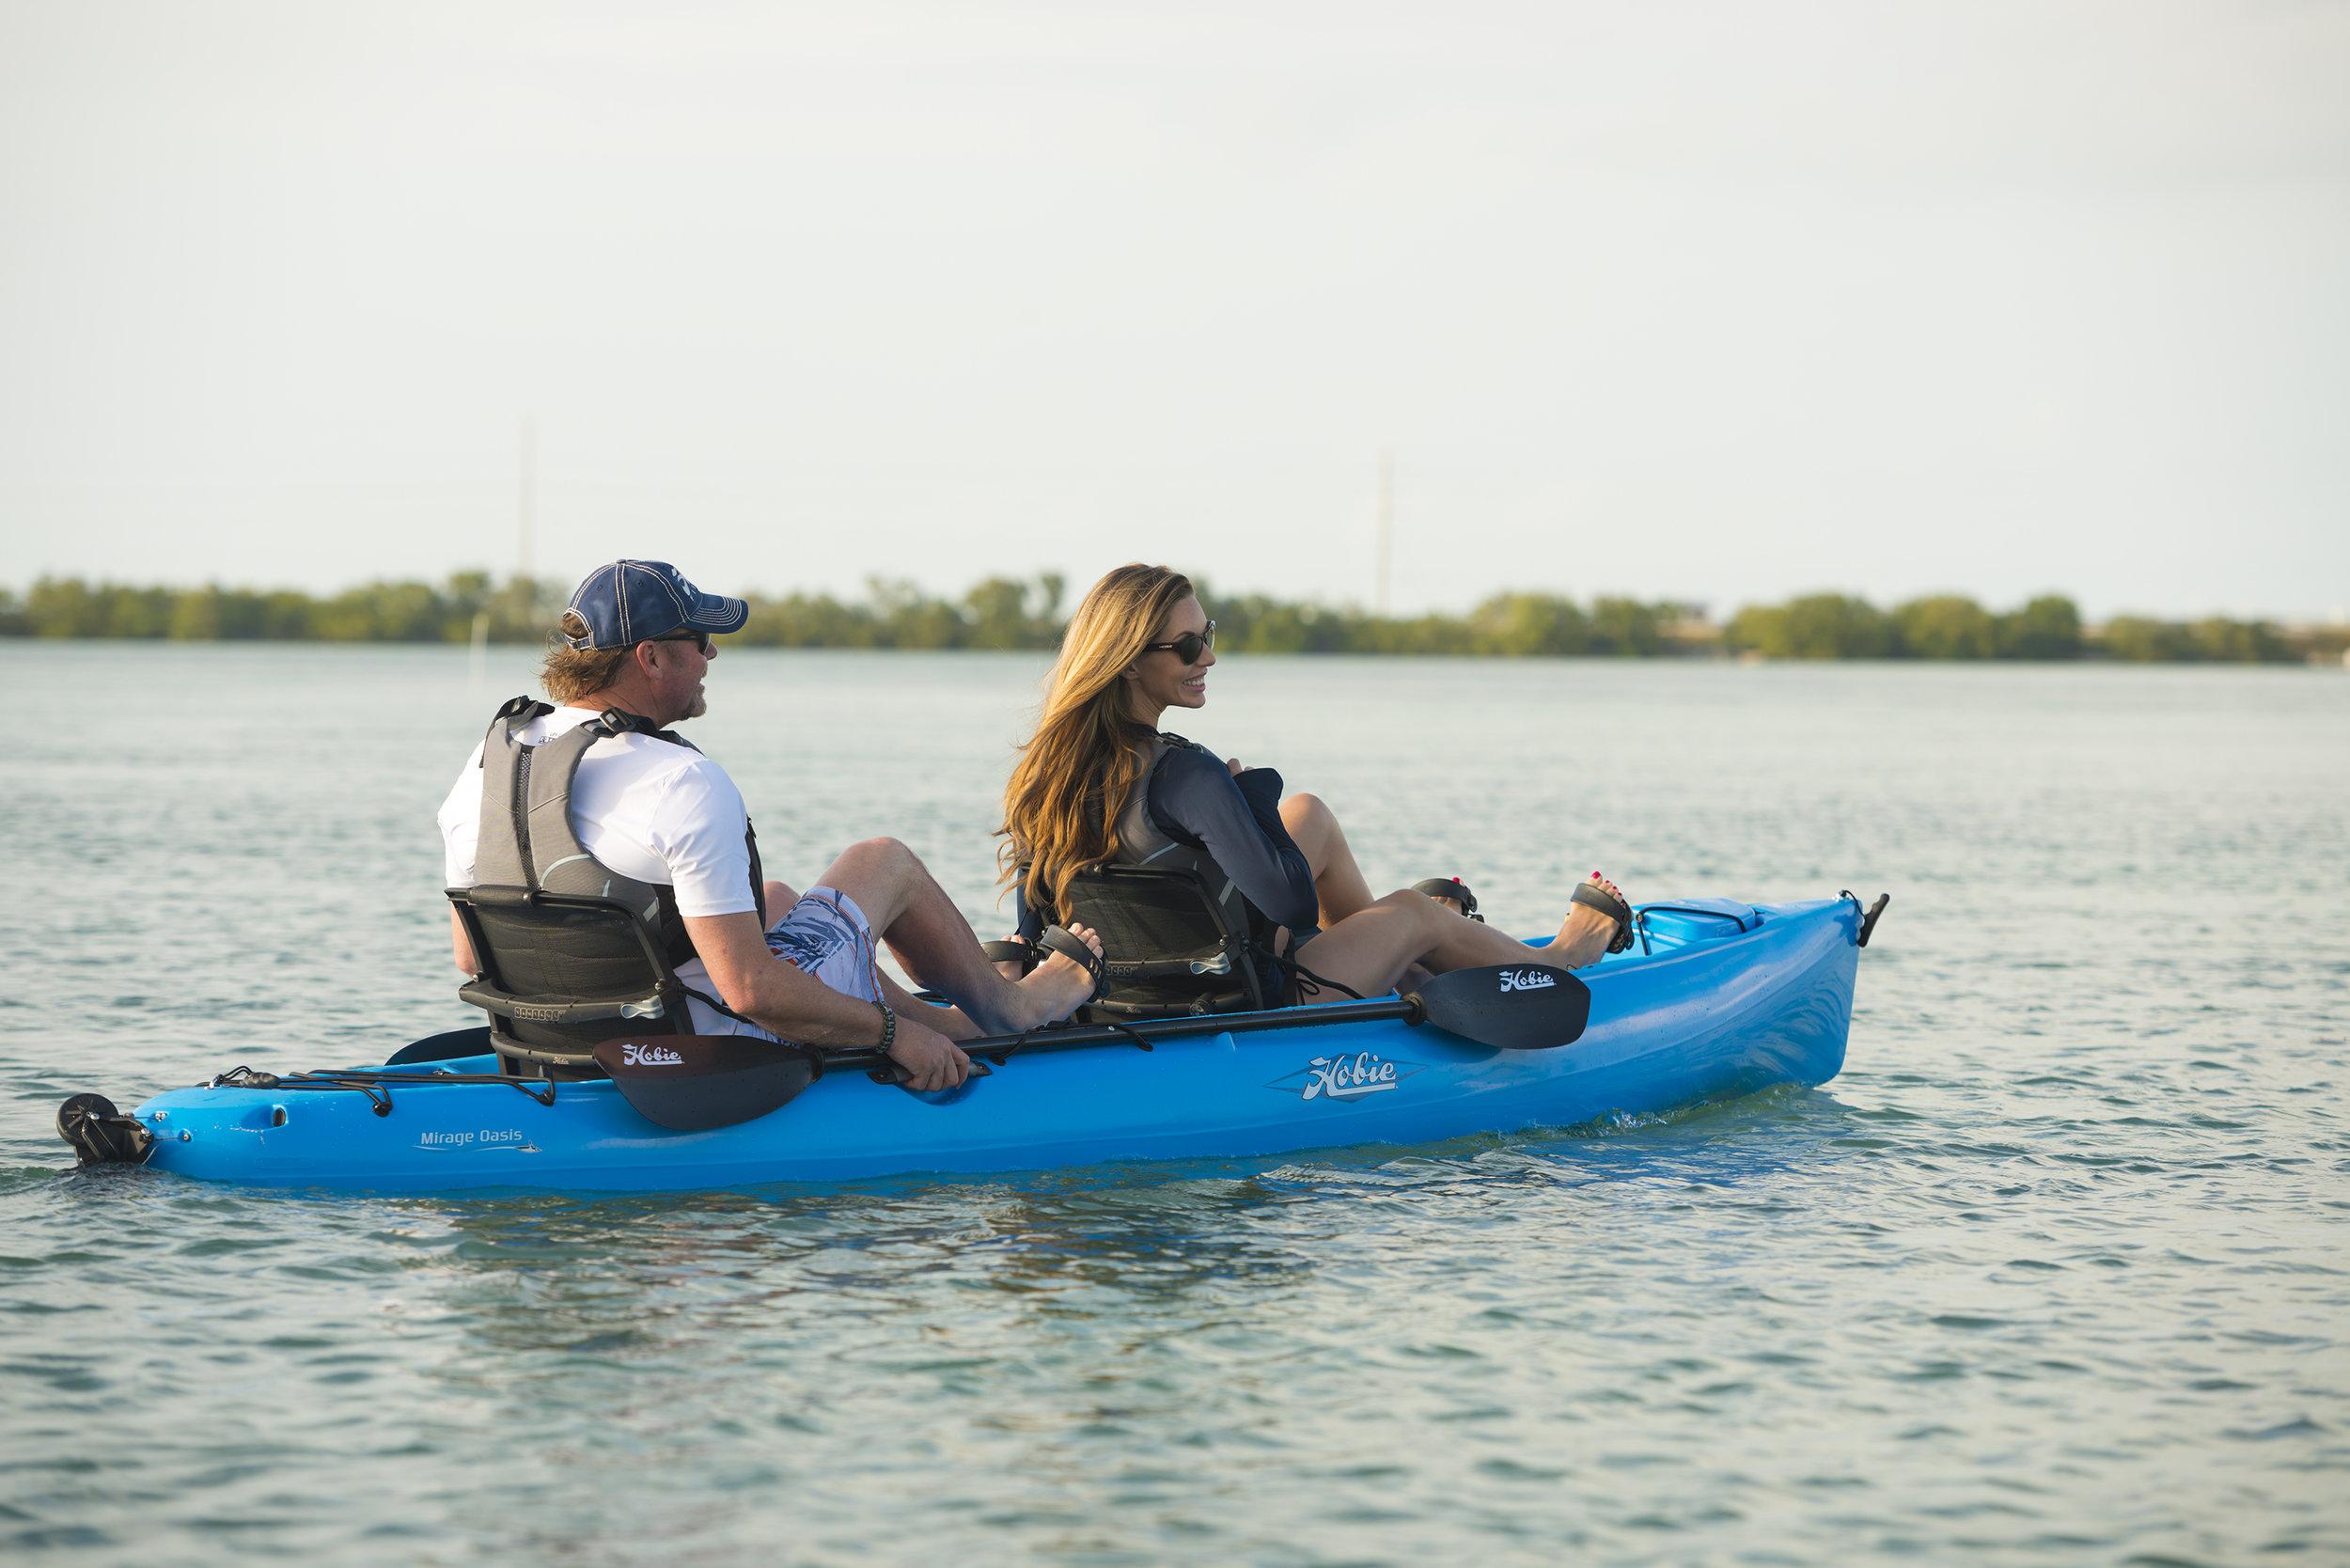 Oasis-action-blue-Florida-Root-smiles-lg.jpg